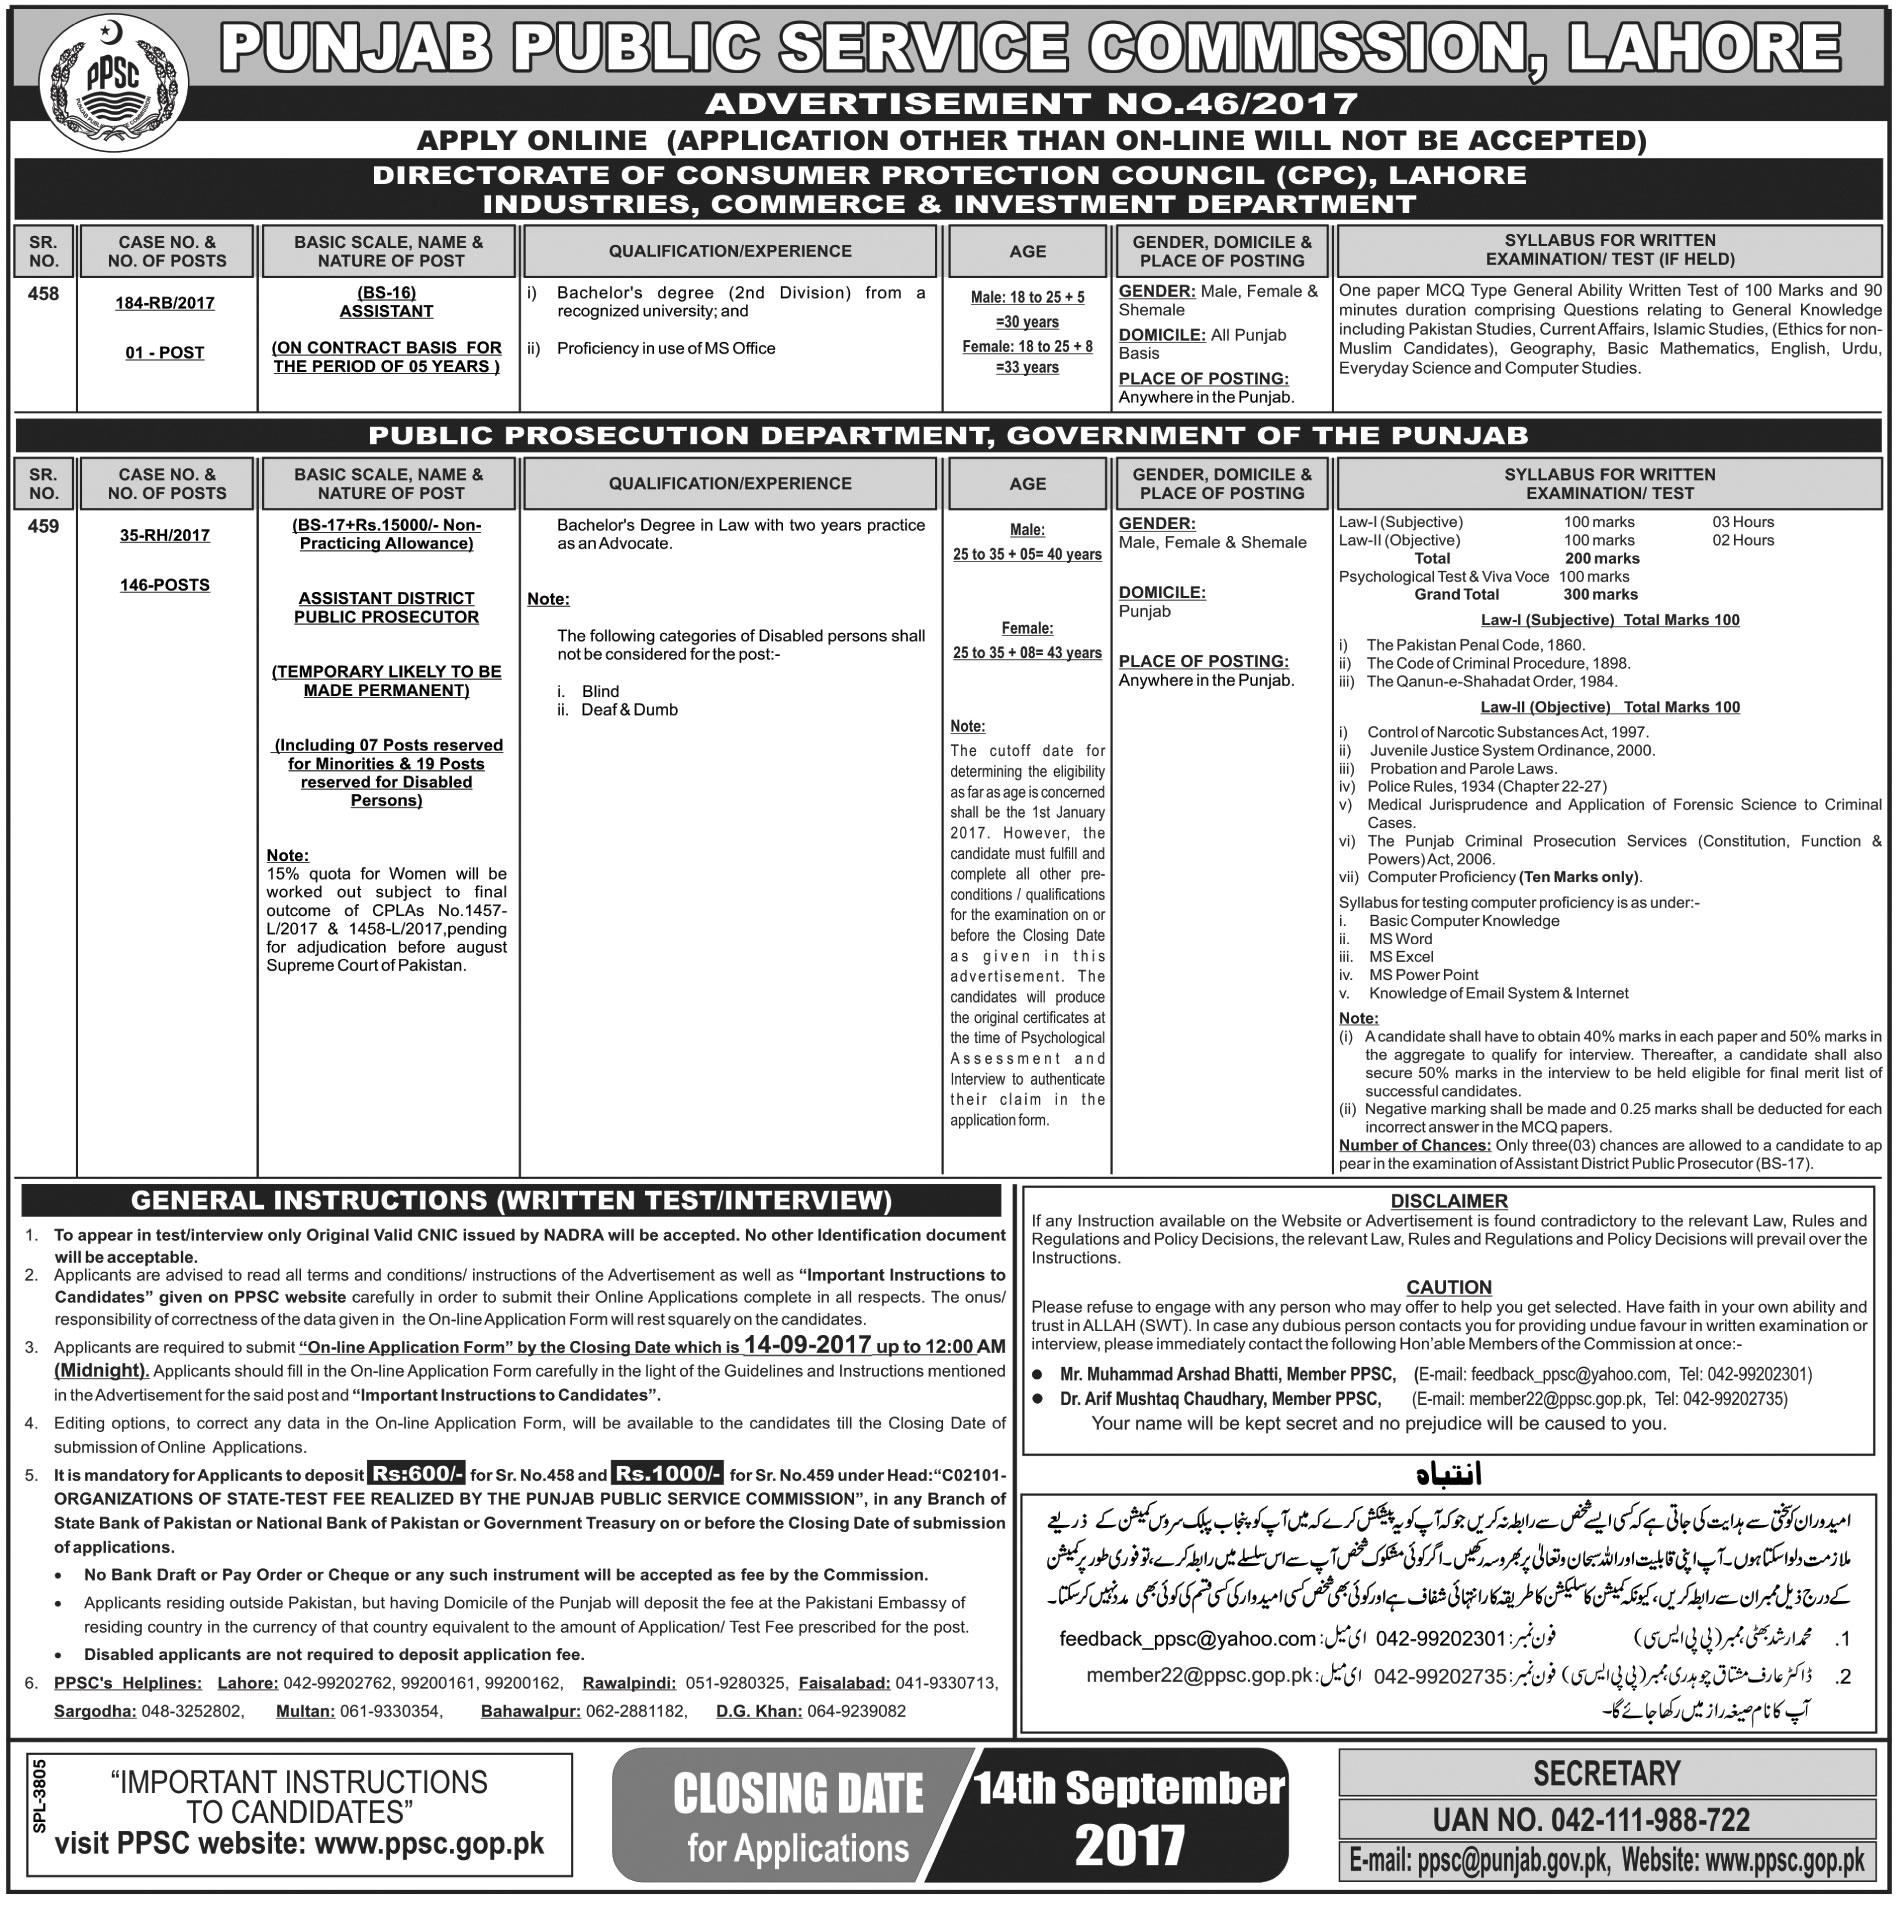 Public Prosecution Department Govt of Punjab PPSC Jobs 2017 Online Apply Test Date